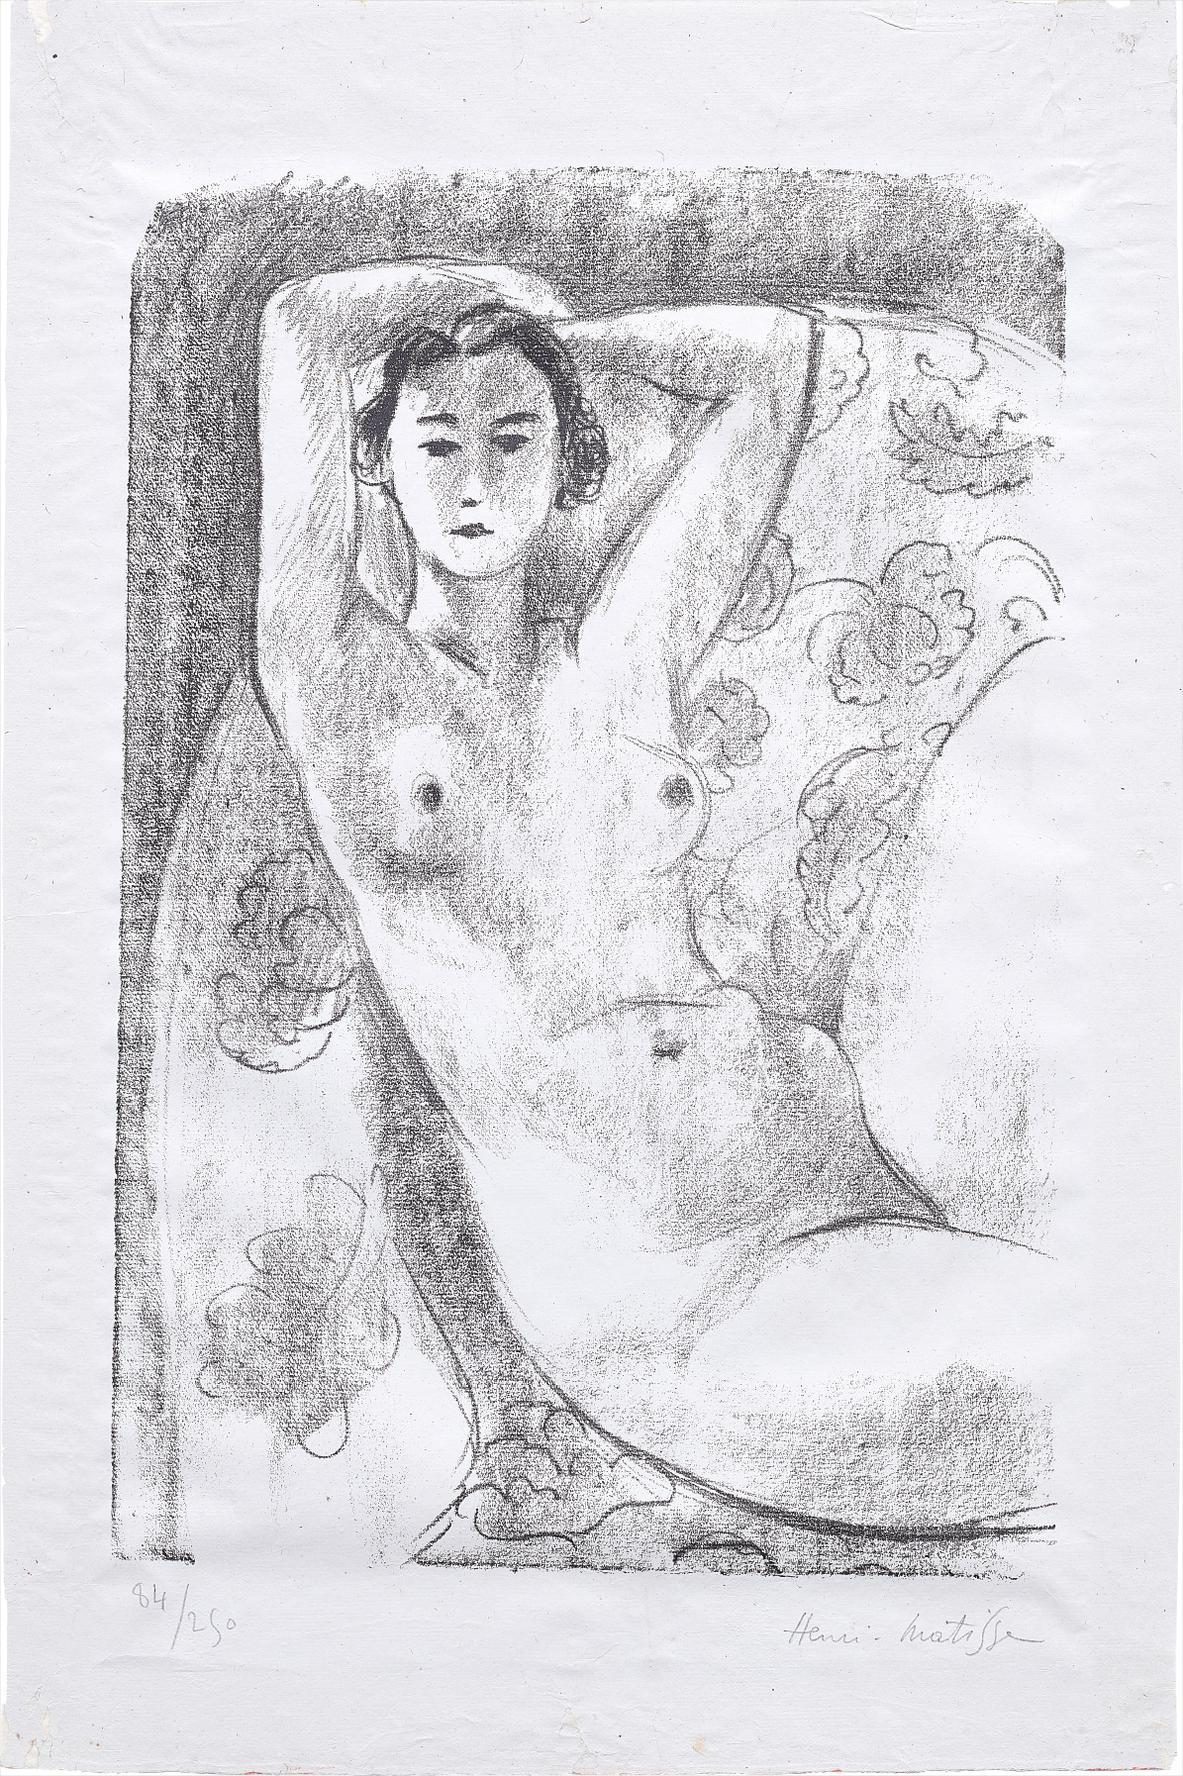 Henri Matisse-Nu Assis Dans Un Fauteuil Au Decor Fleuri (Nude Sitting In A Floral Decorated Armchair)-1924